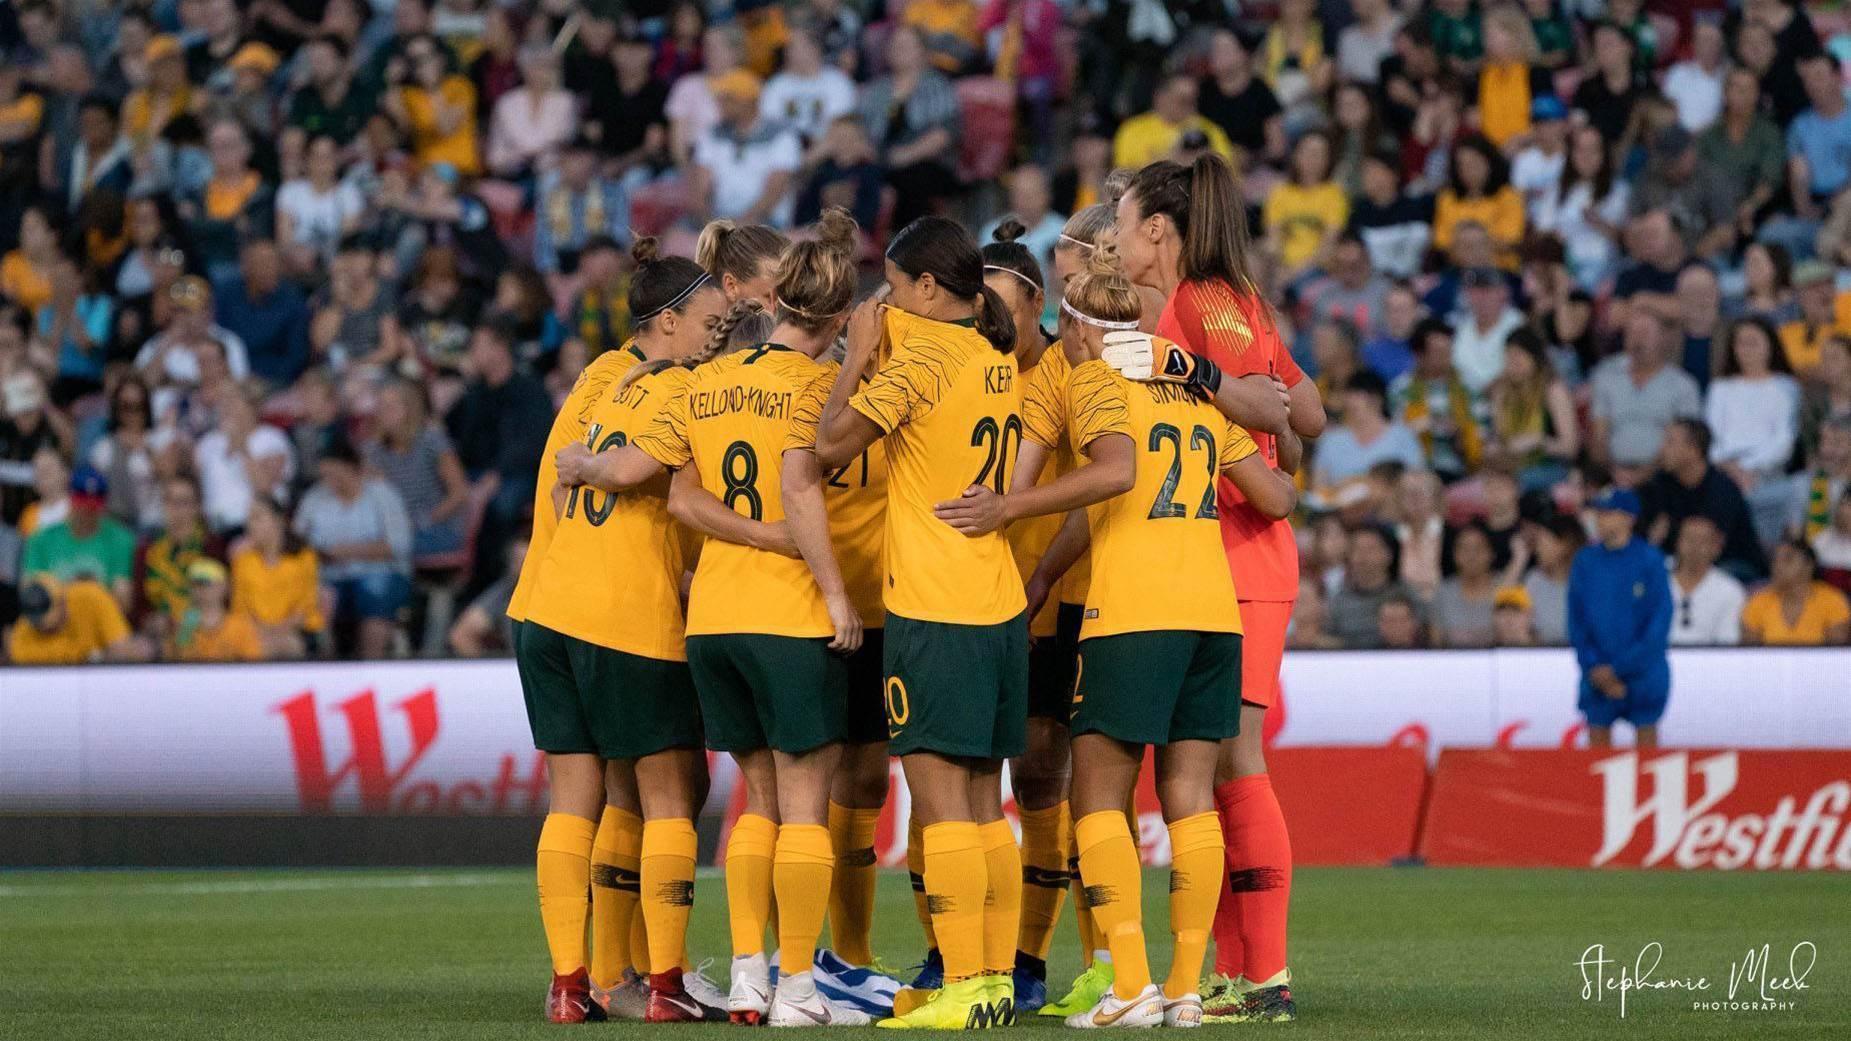 Matildas set for World Cup seeding